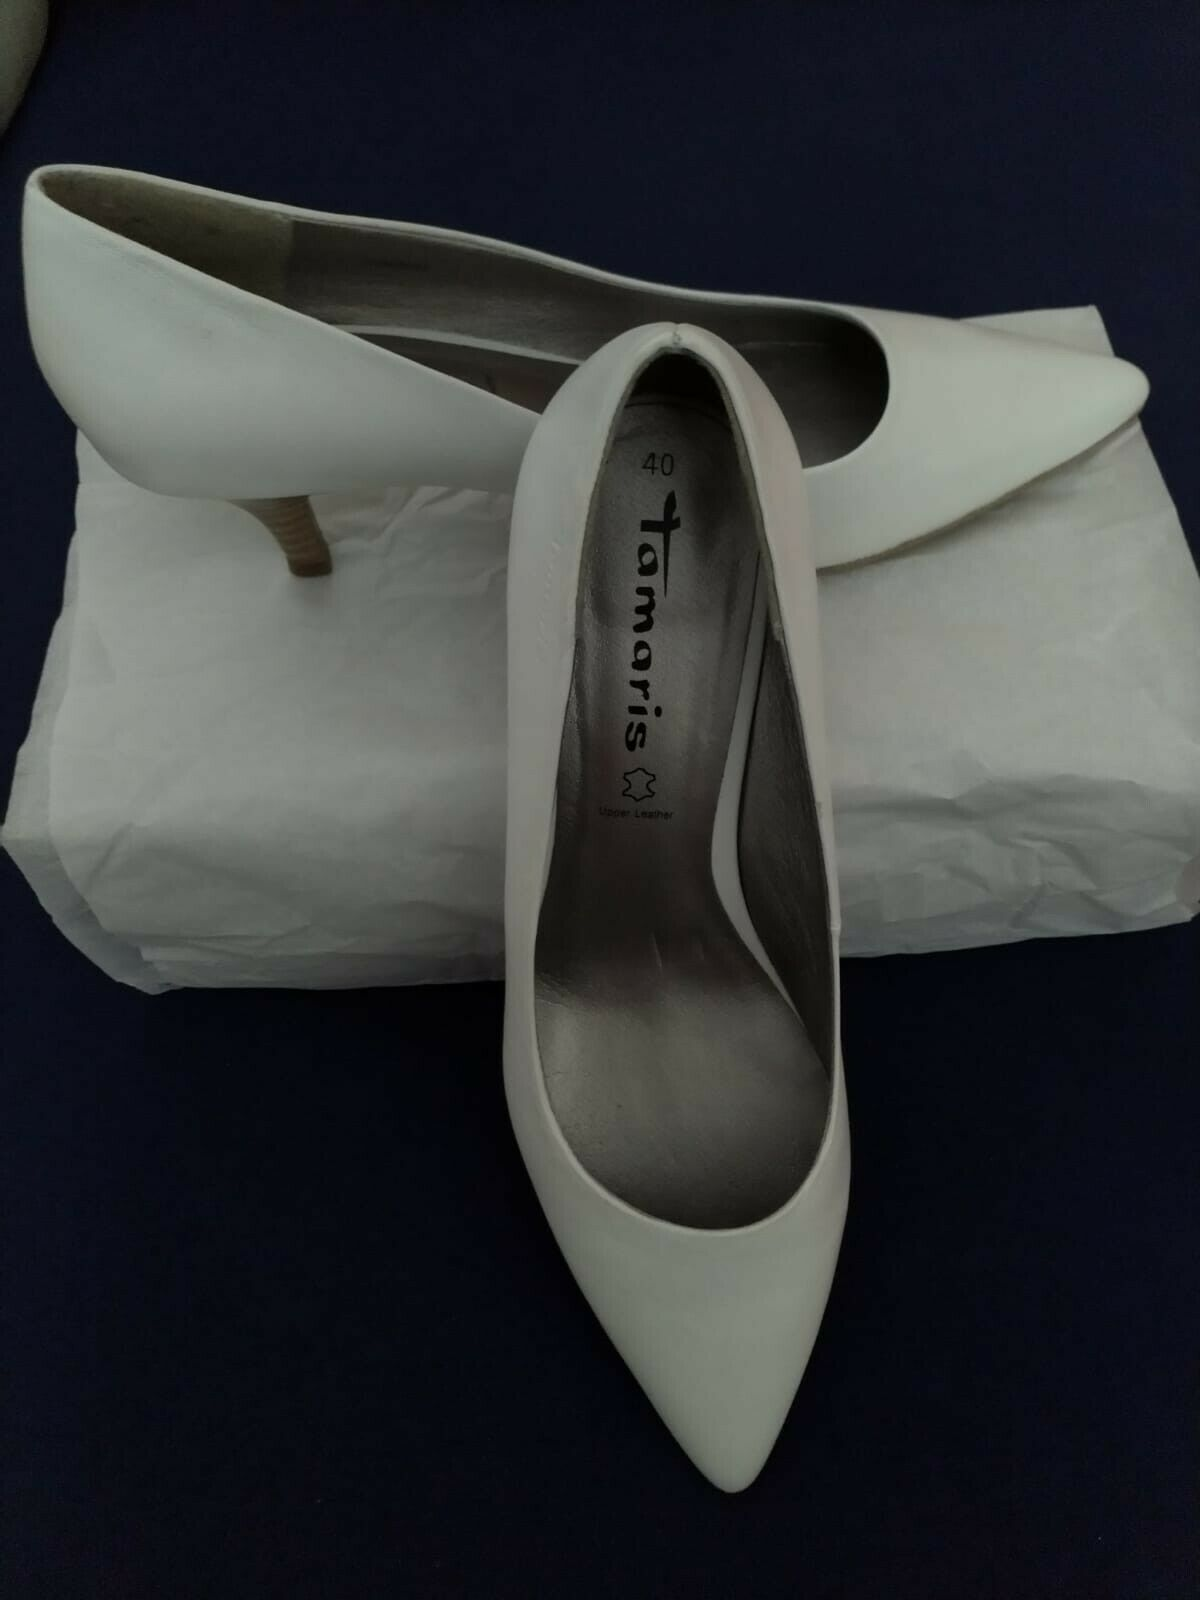 Elegant White Bridal Shoes, Pumps, Medium Heel, Womens, Size 40